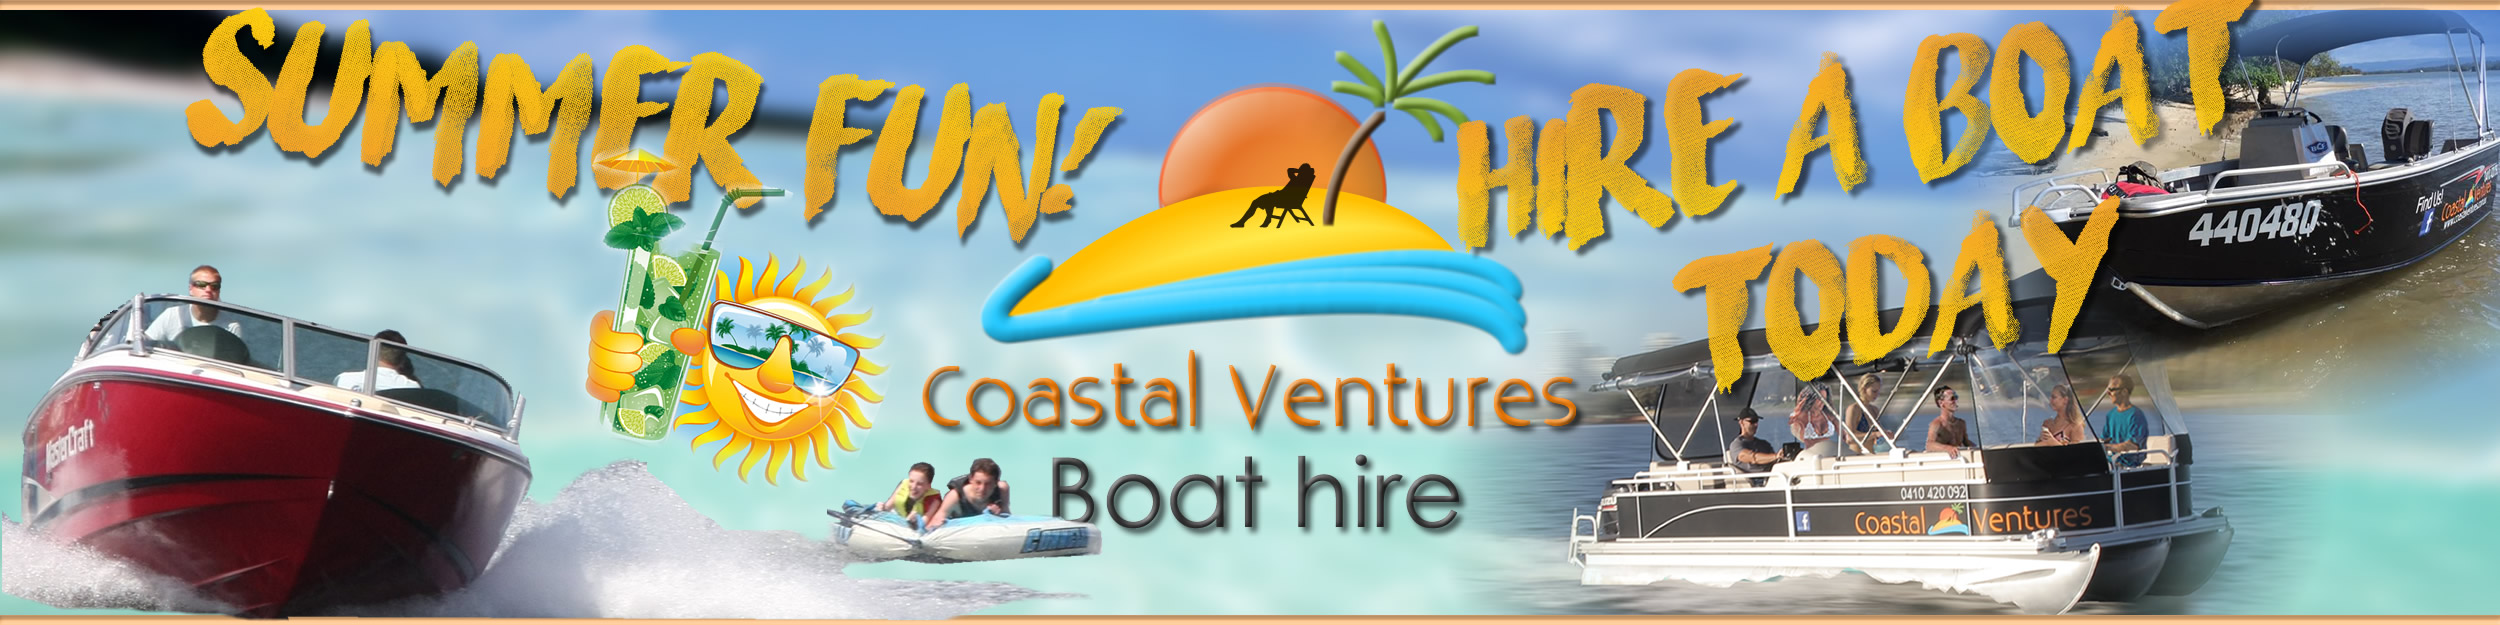 Coastal Ventures Boat Hire